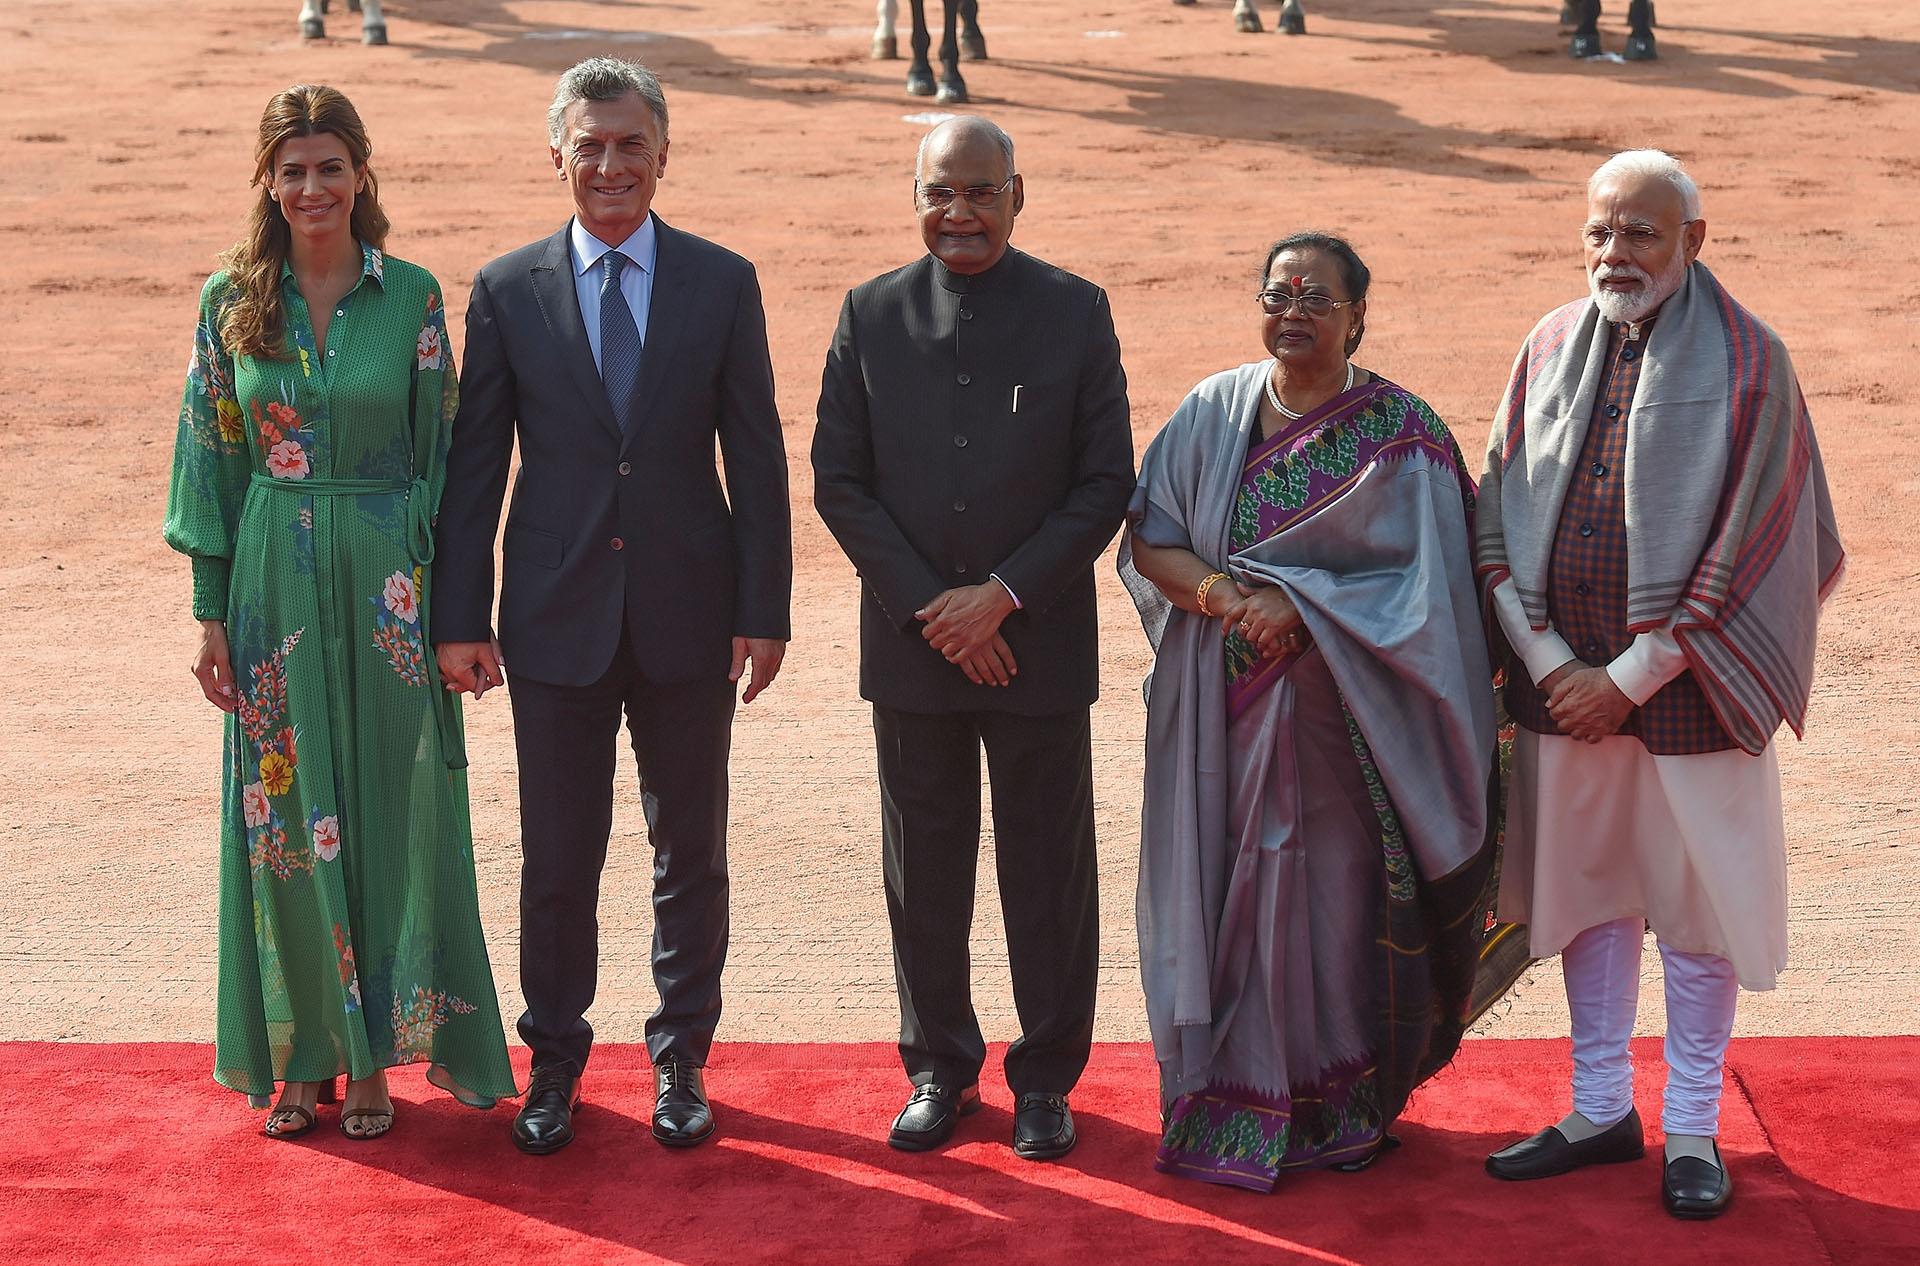 Awada, Macri, Ram Nath Kovind, Savita Kovind -primera dama de India- y Modi